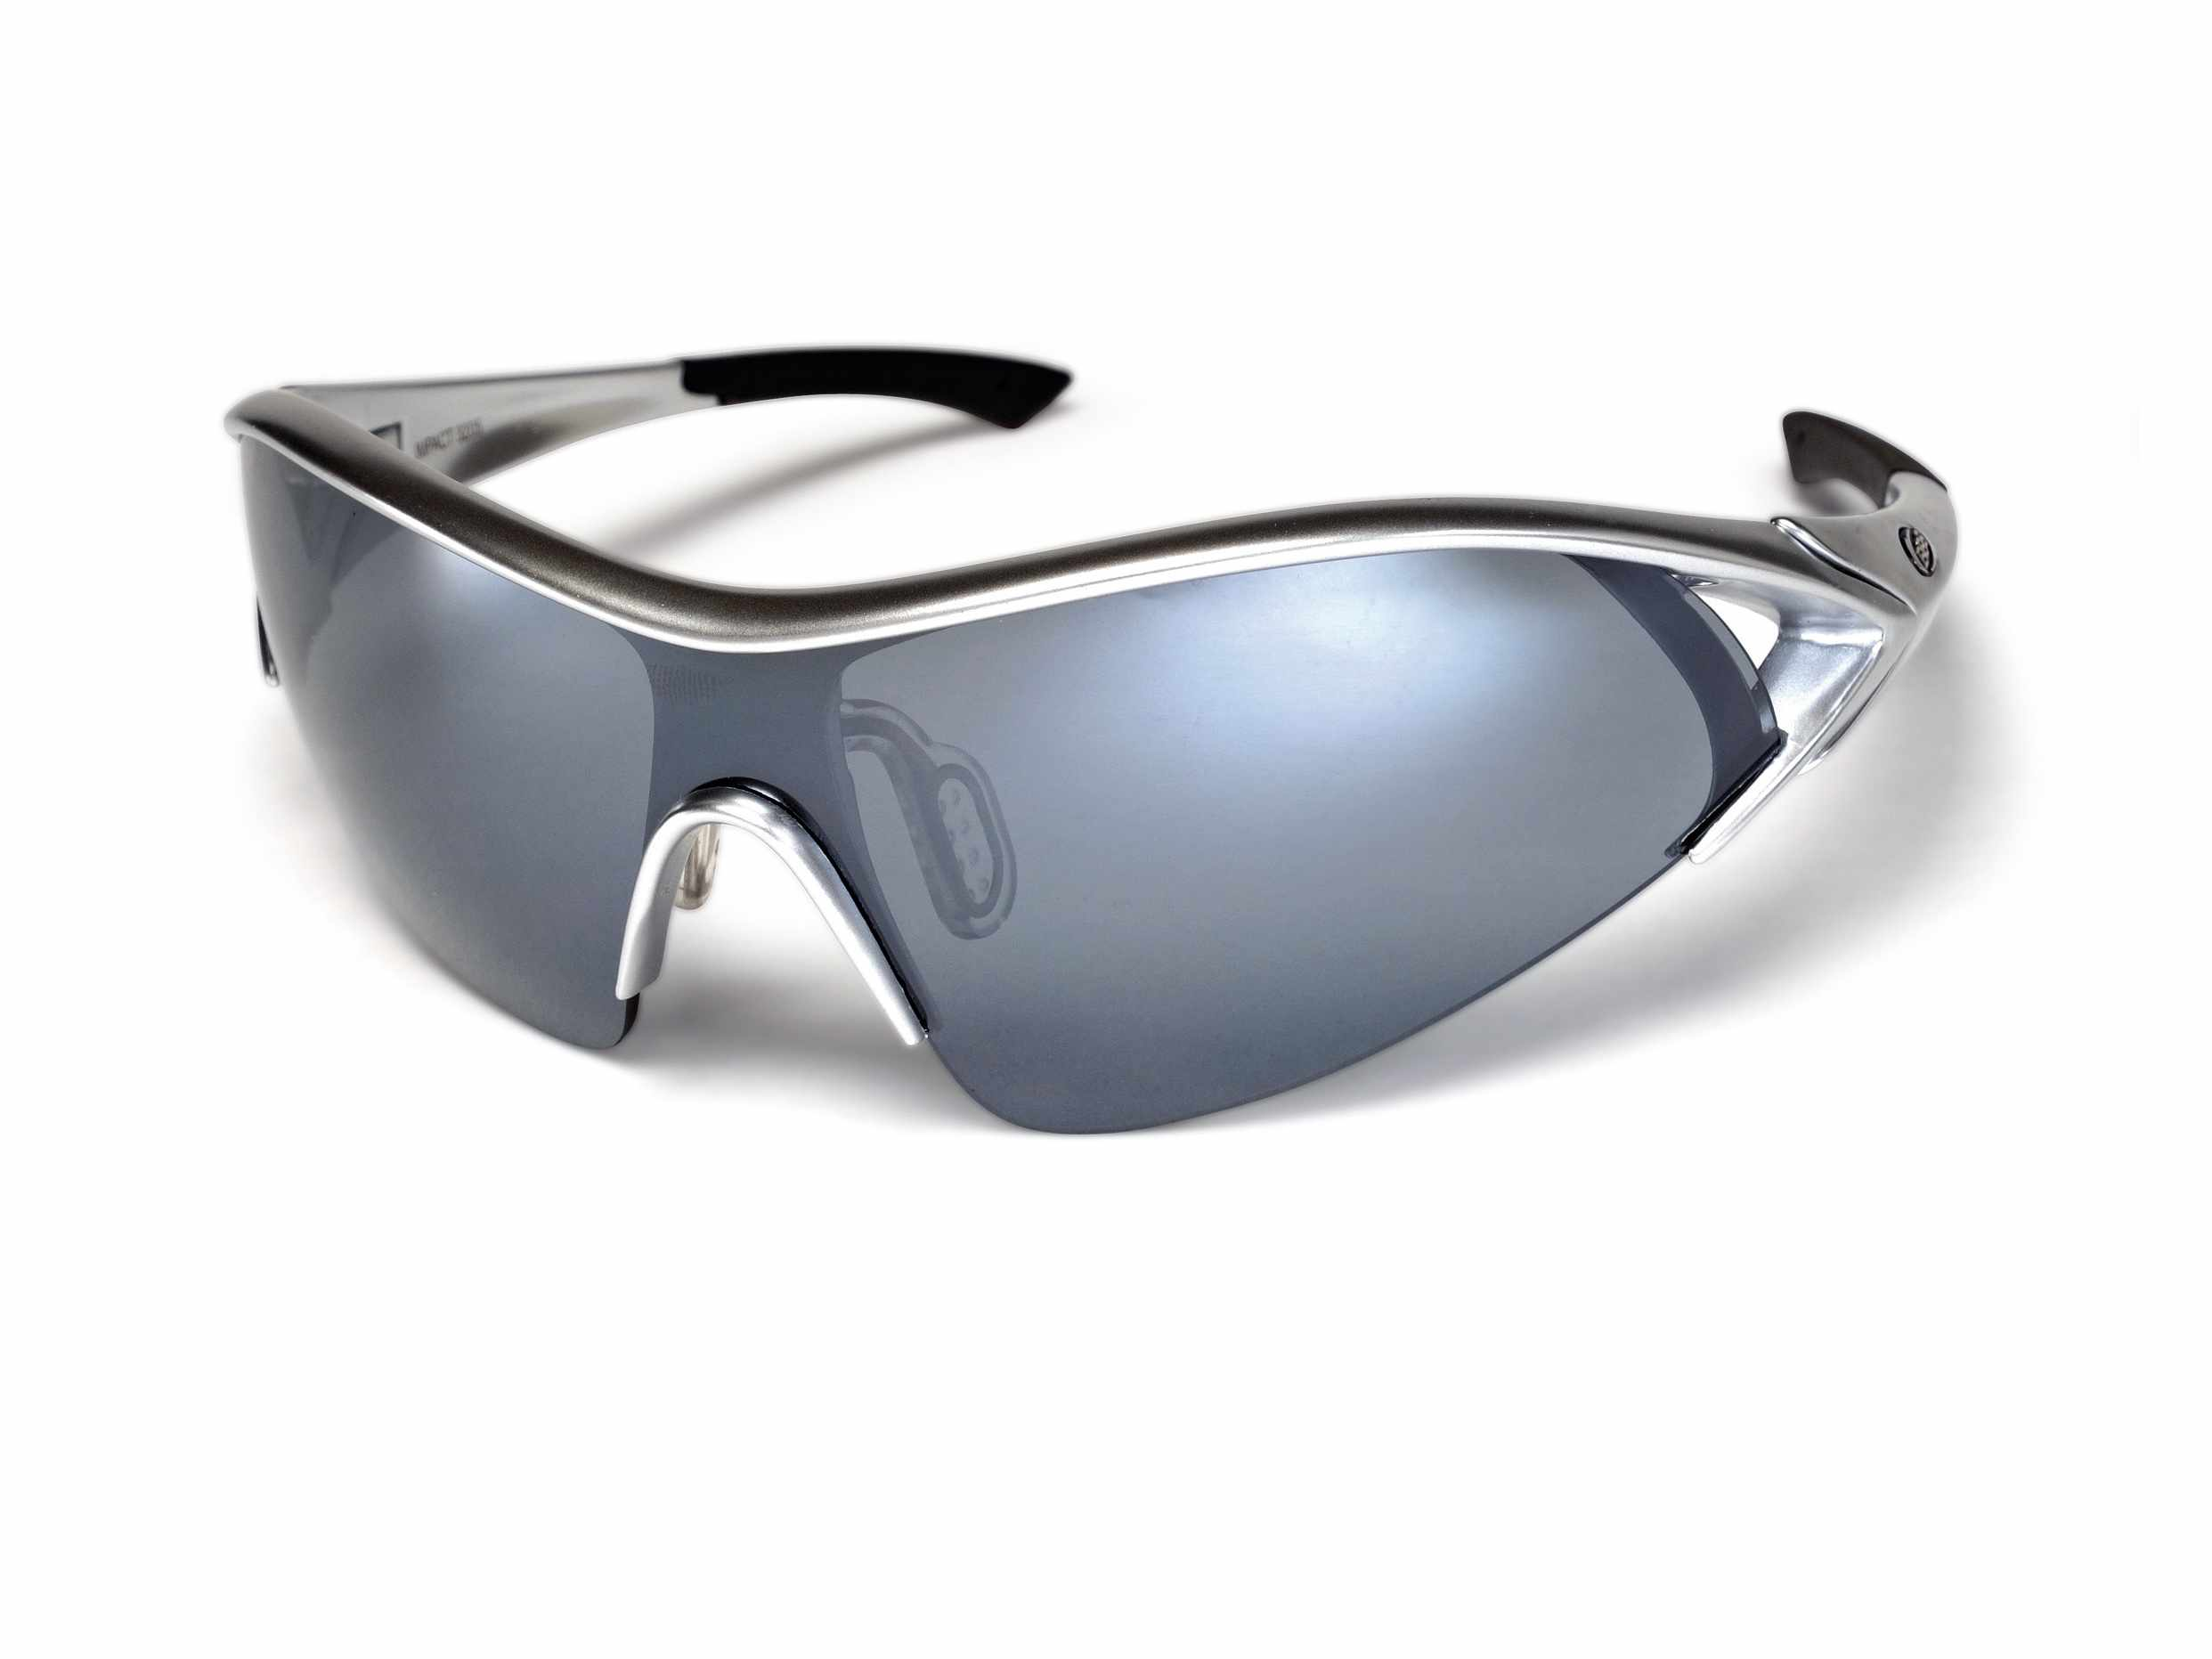 BBB Impact sunglasses